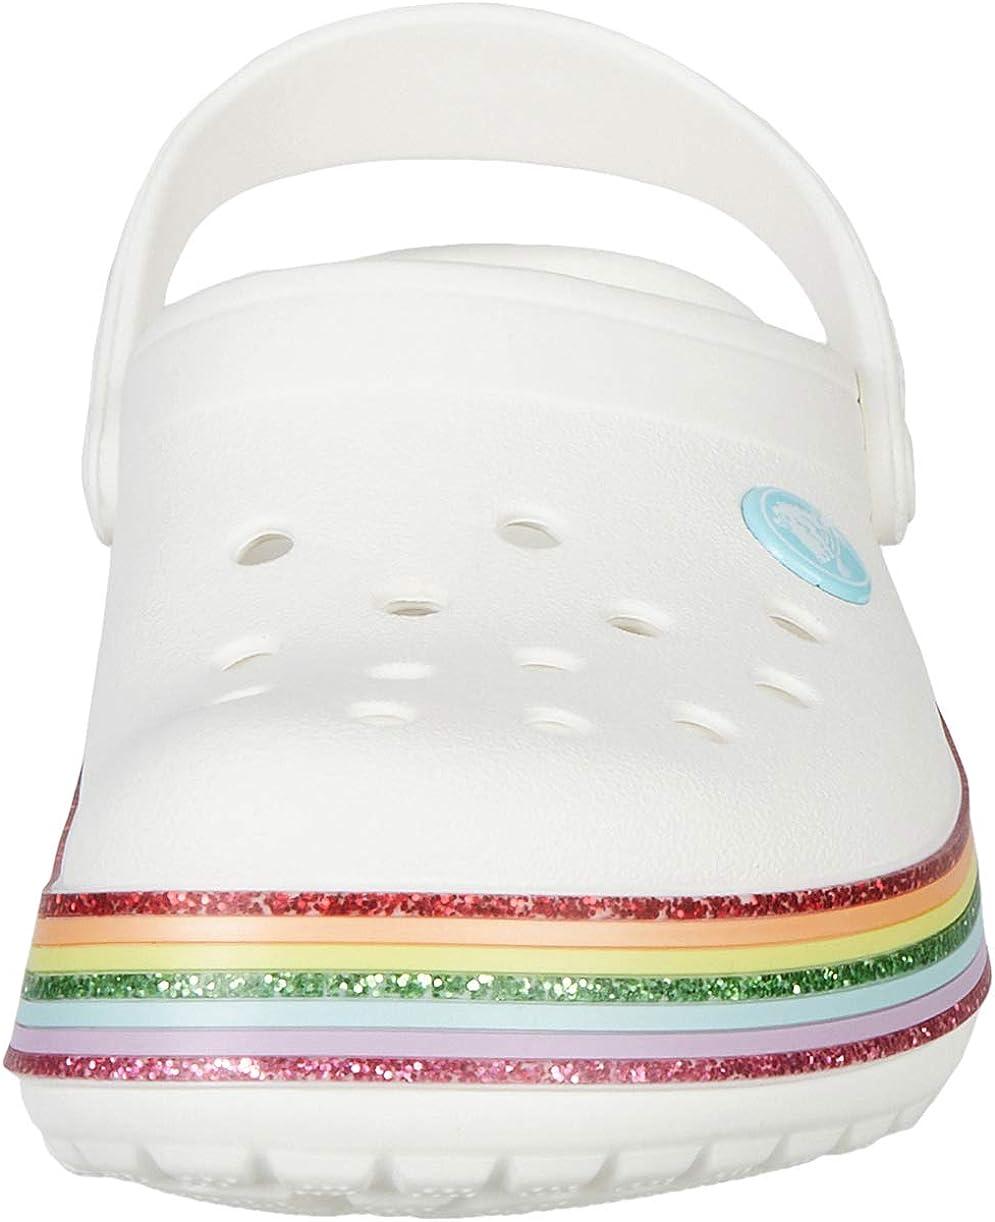 Crocs Unisex Kids Crocband Rainbow Glitter Clogs